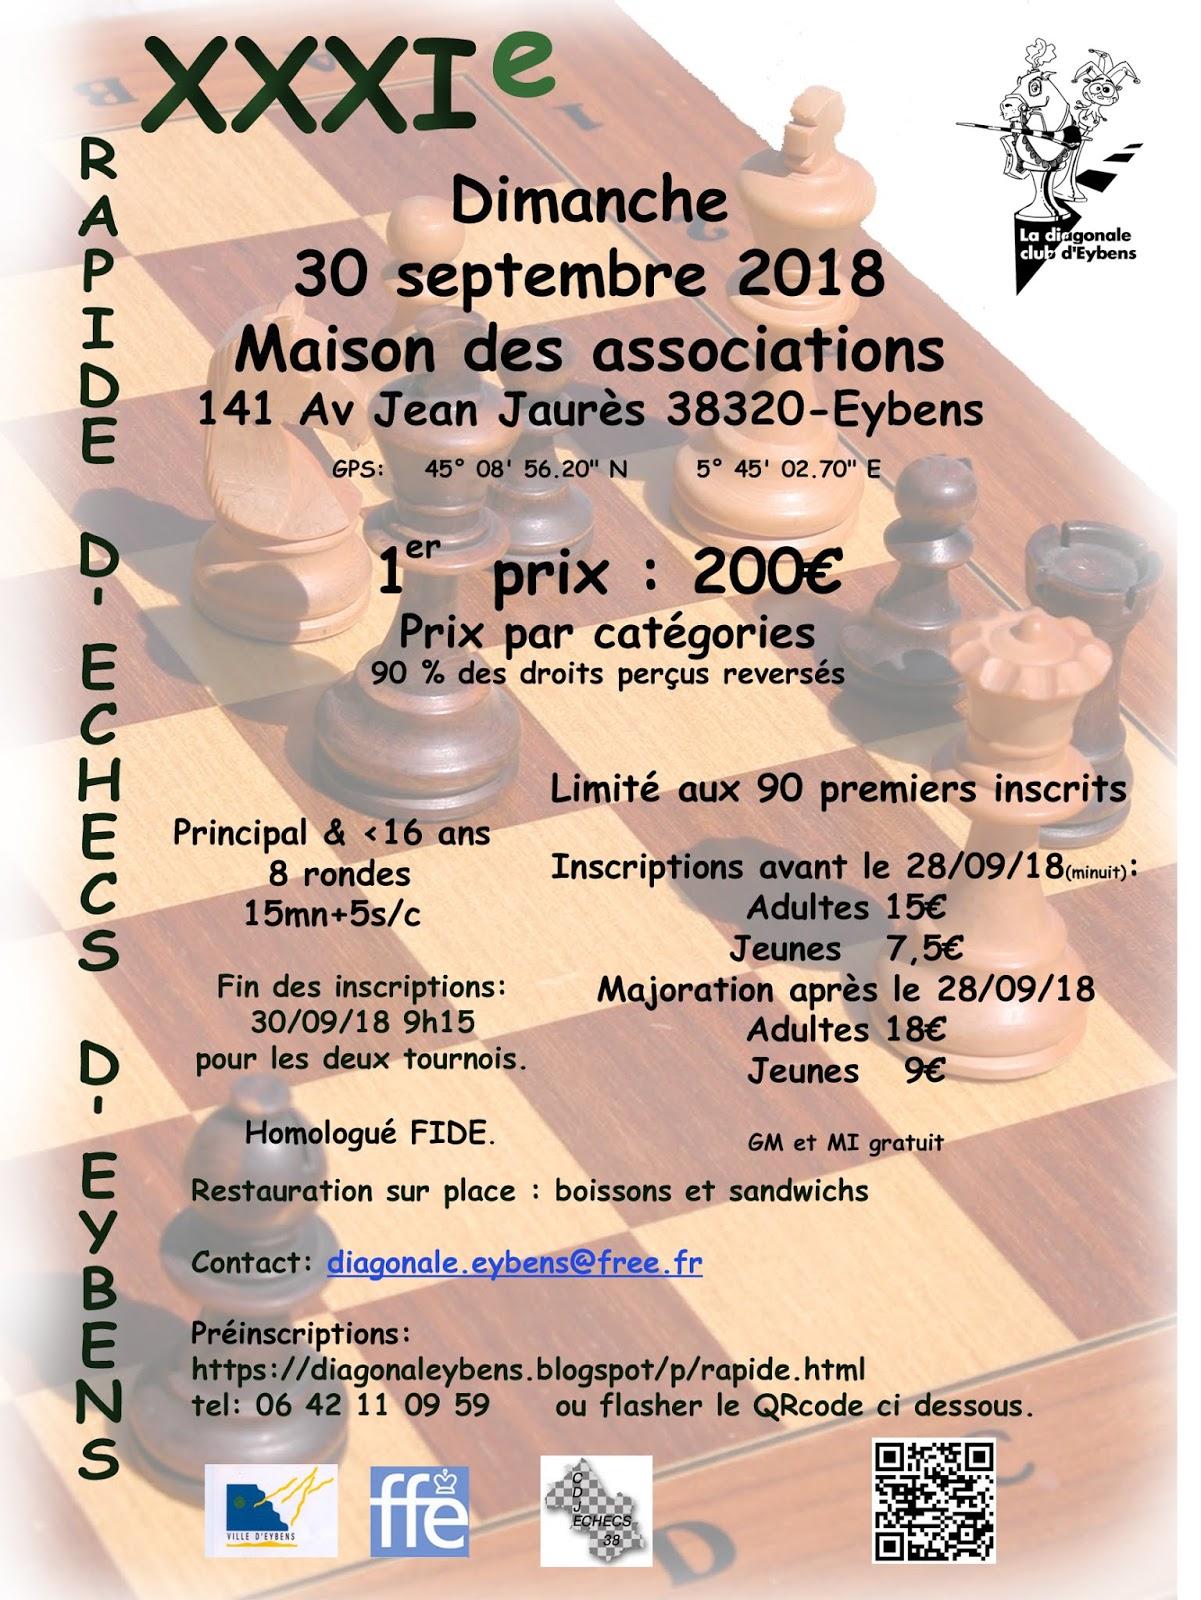 XXXIᵉ Rapide d'Eybens @ Maison des Associations